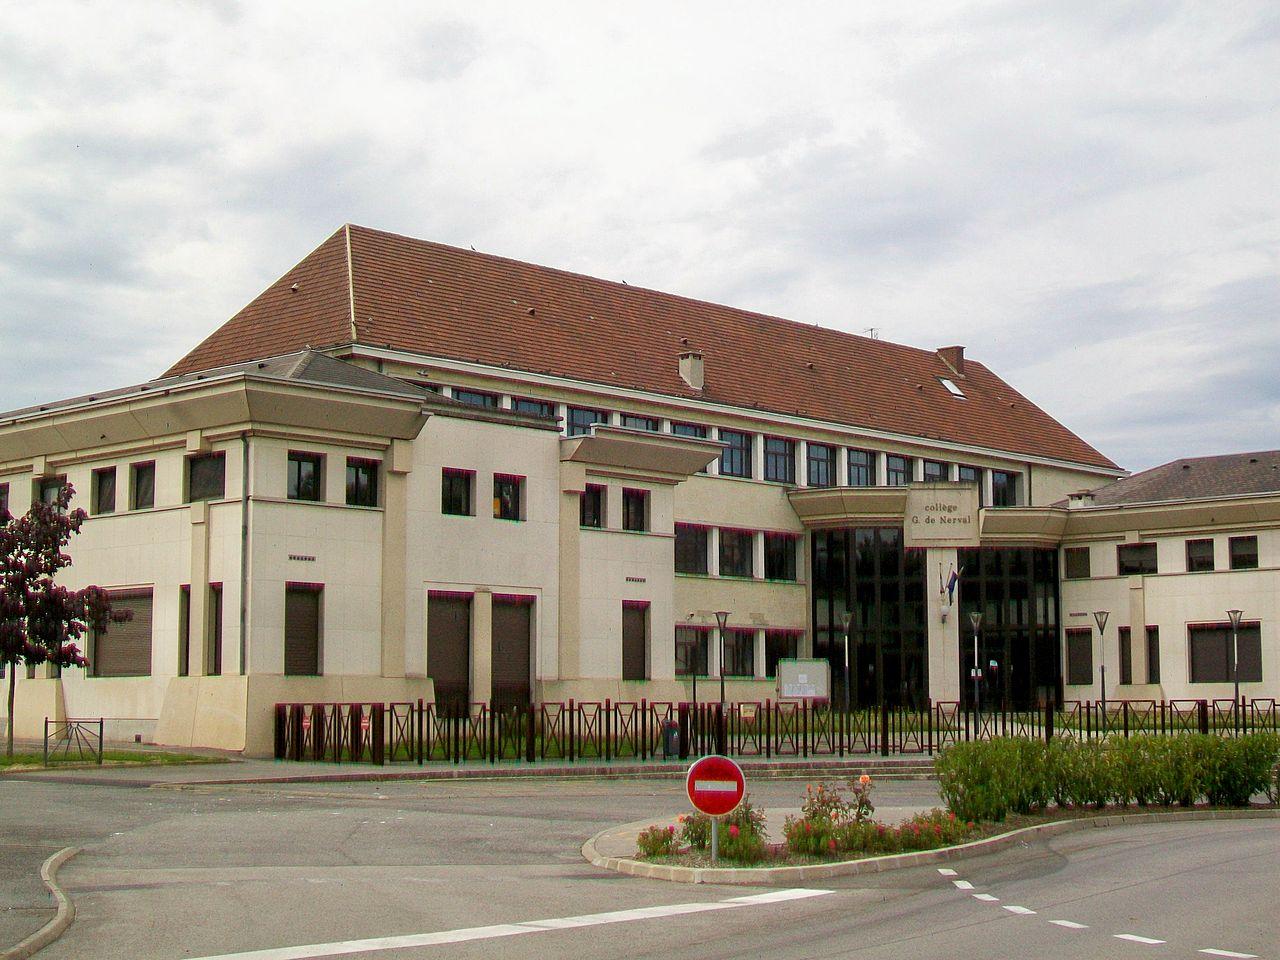 Cr Ef Bf Bdpy En Valois Magasin  Ef Bf Bdlectronique Centre Ville